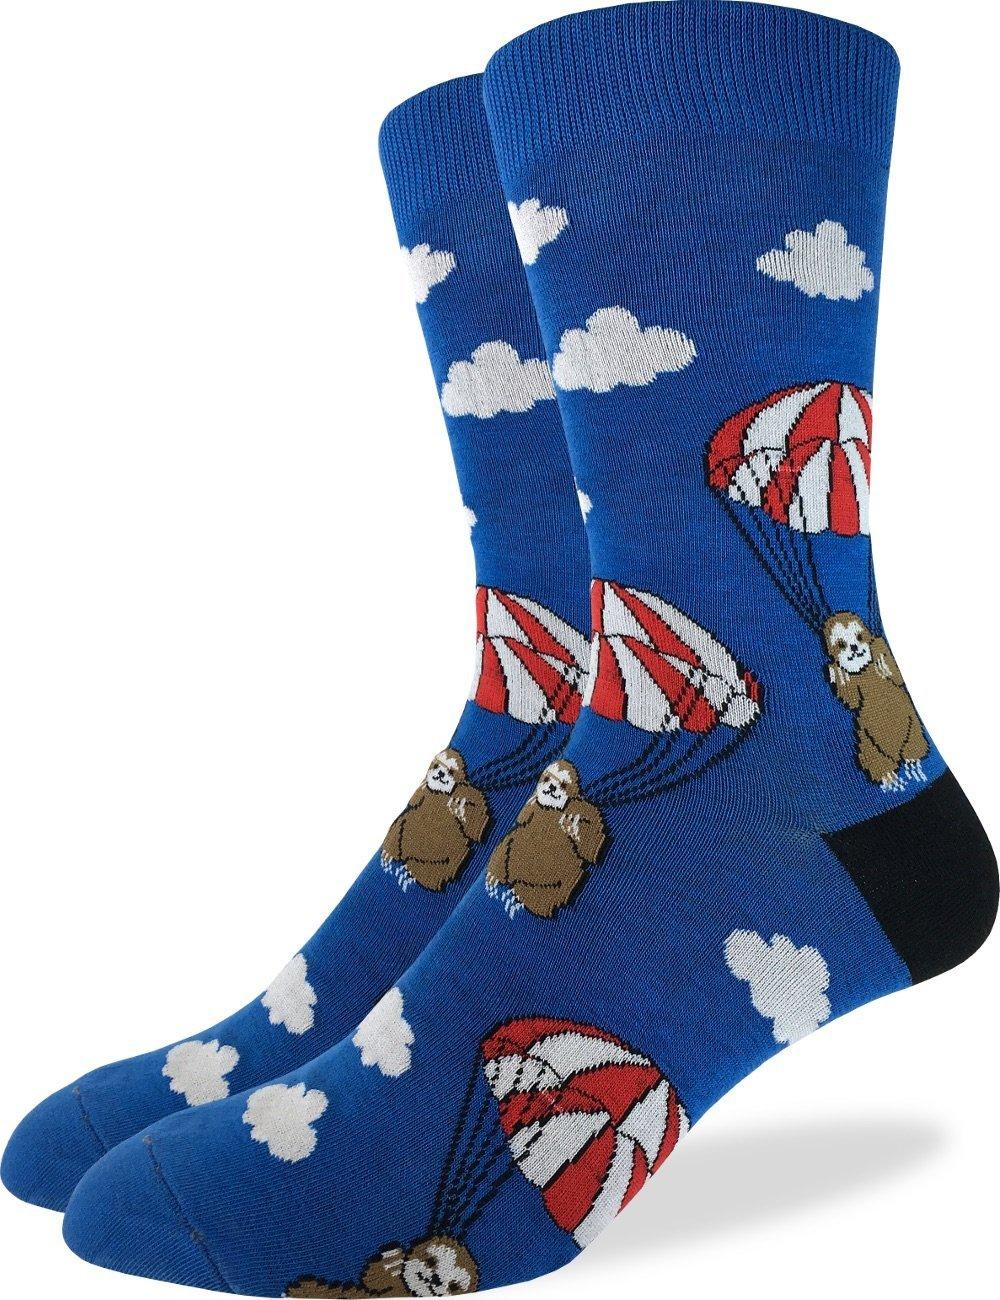 Good Luck Sock Men'S Parachuting Sloths Crew Socks - Blue, Shoe Size 7-12 - Blue